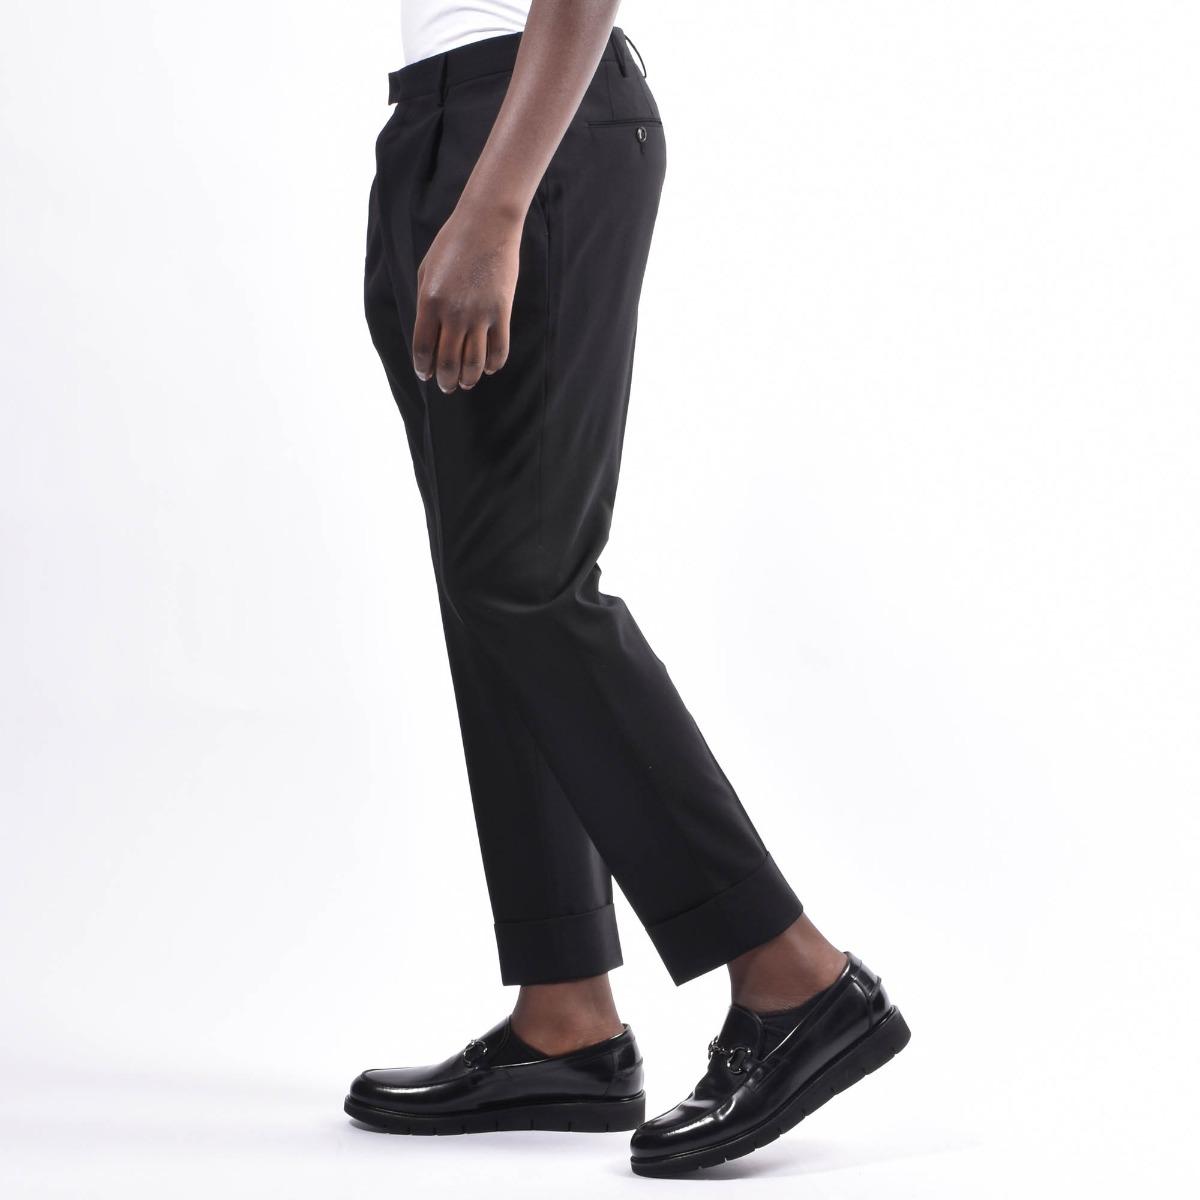 Pantalone pences pt - Nero